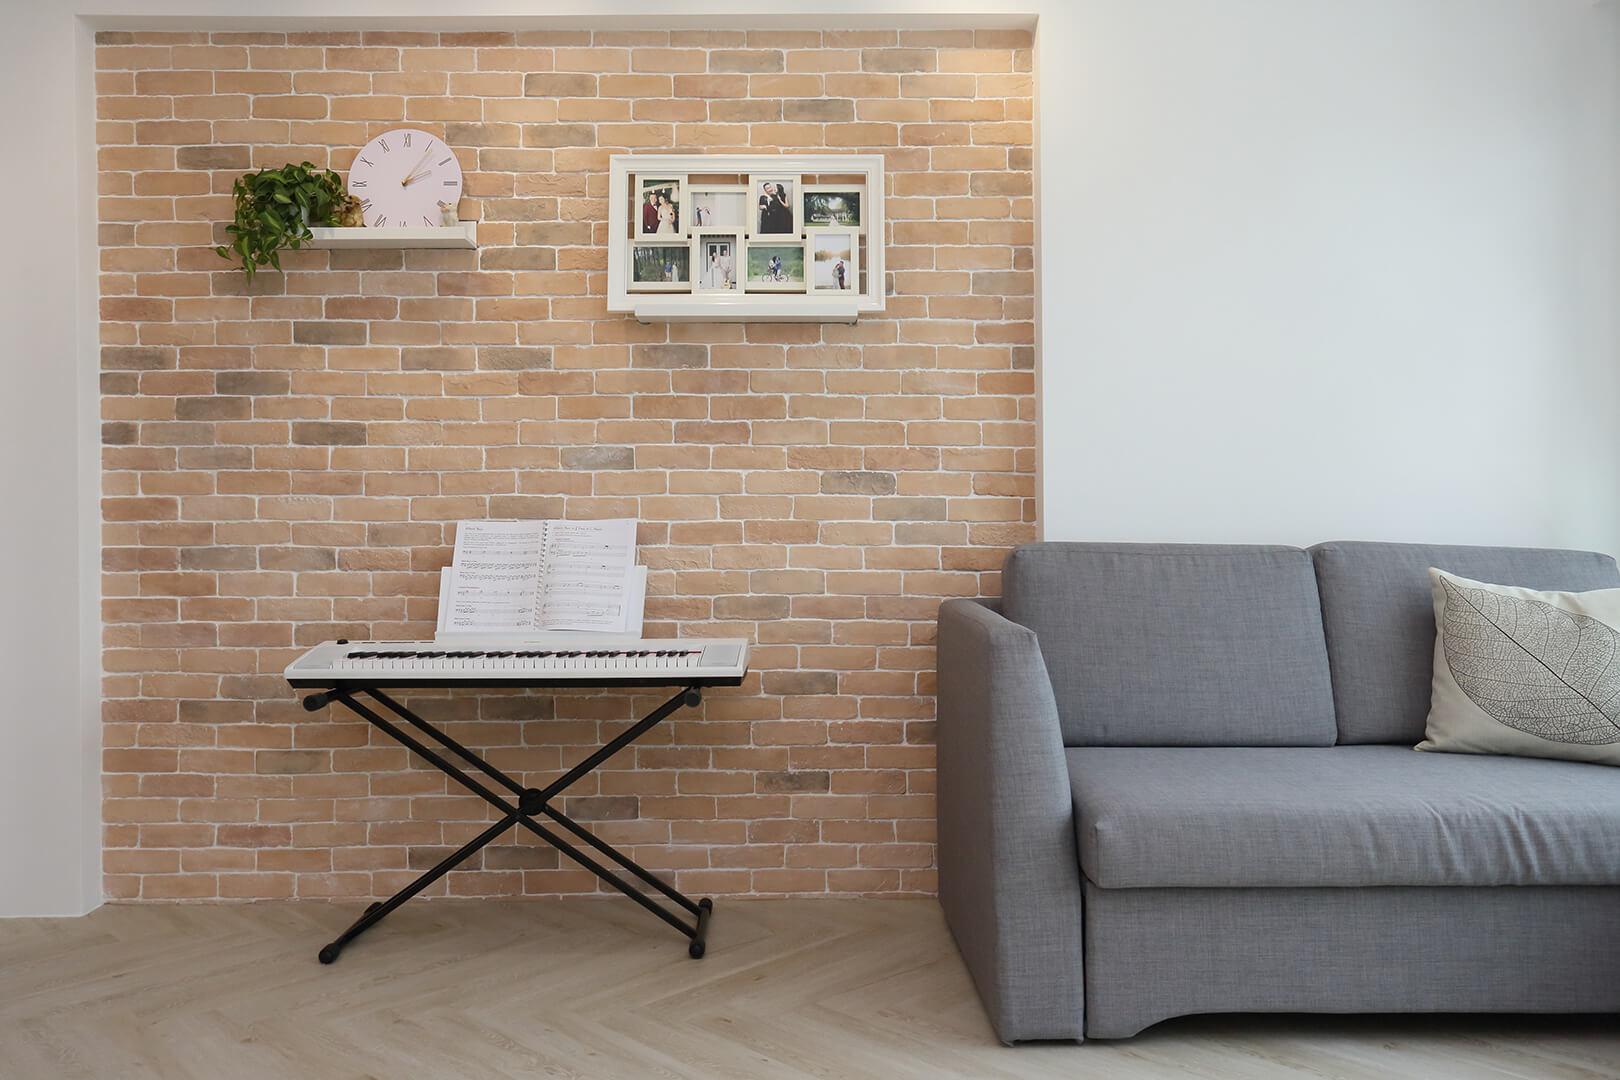 Scandinavian Interior Design Singapore Sofa and Keyboard